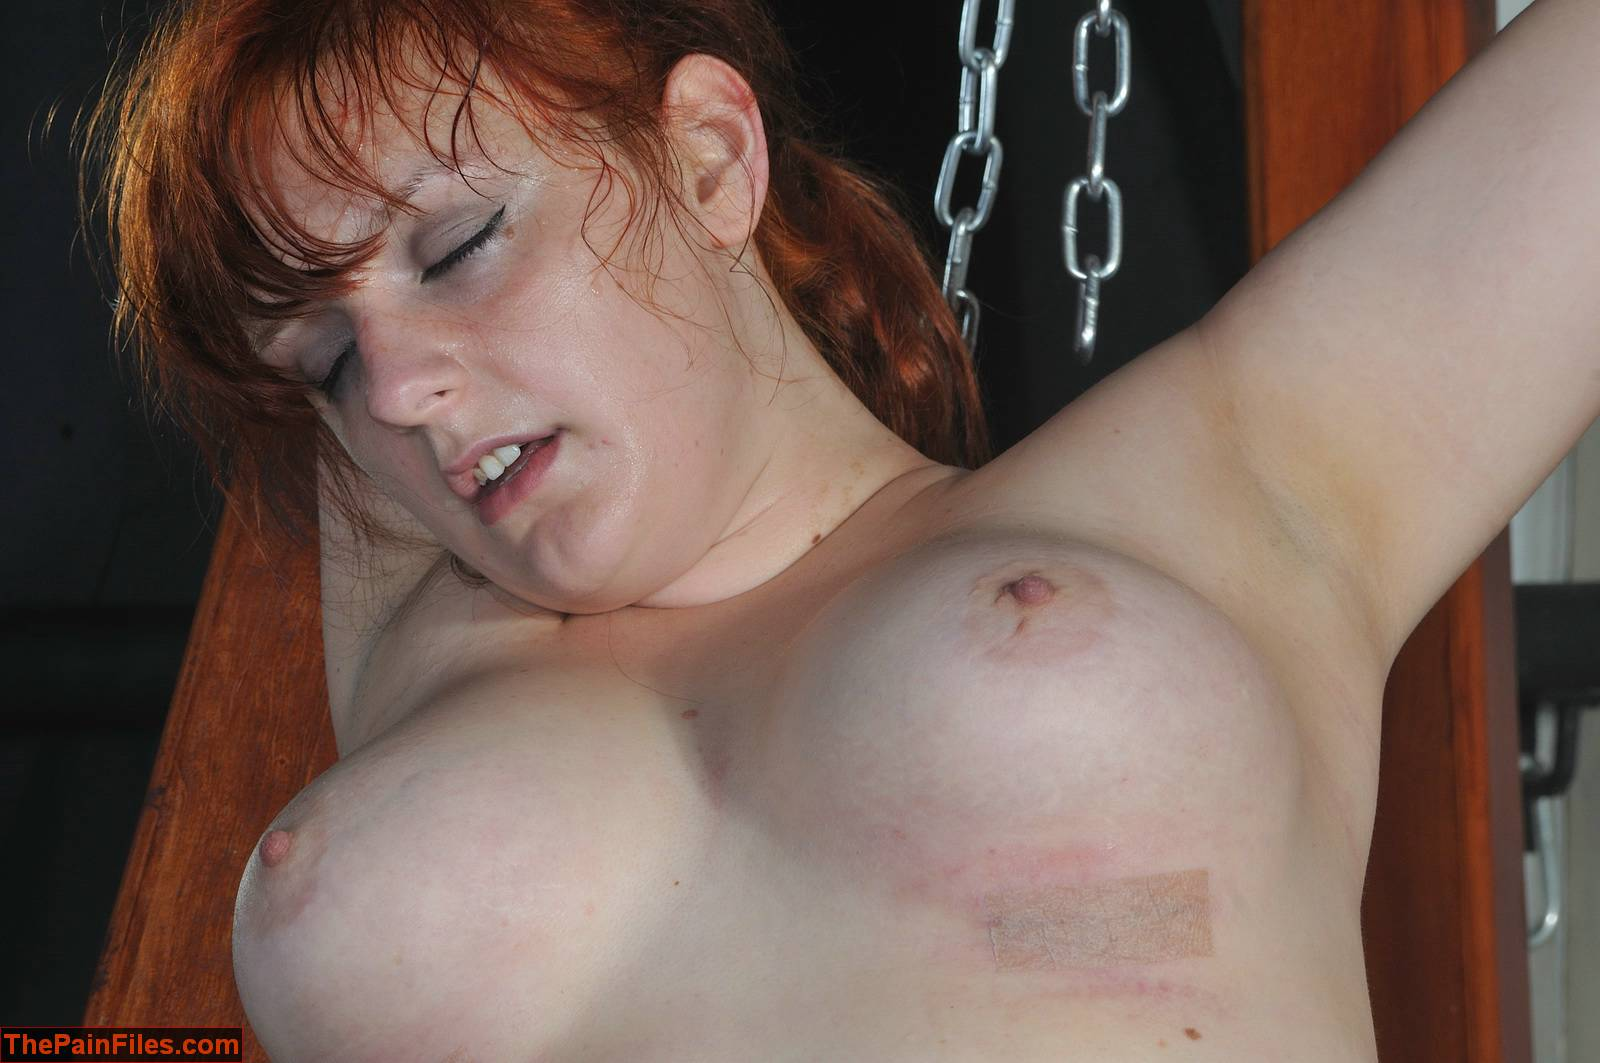 svensk sex film tau bondage fetish